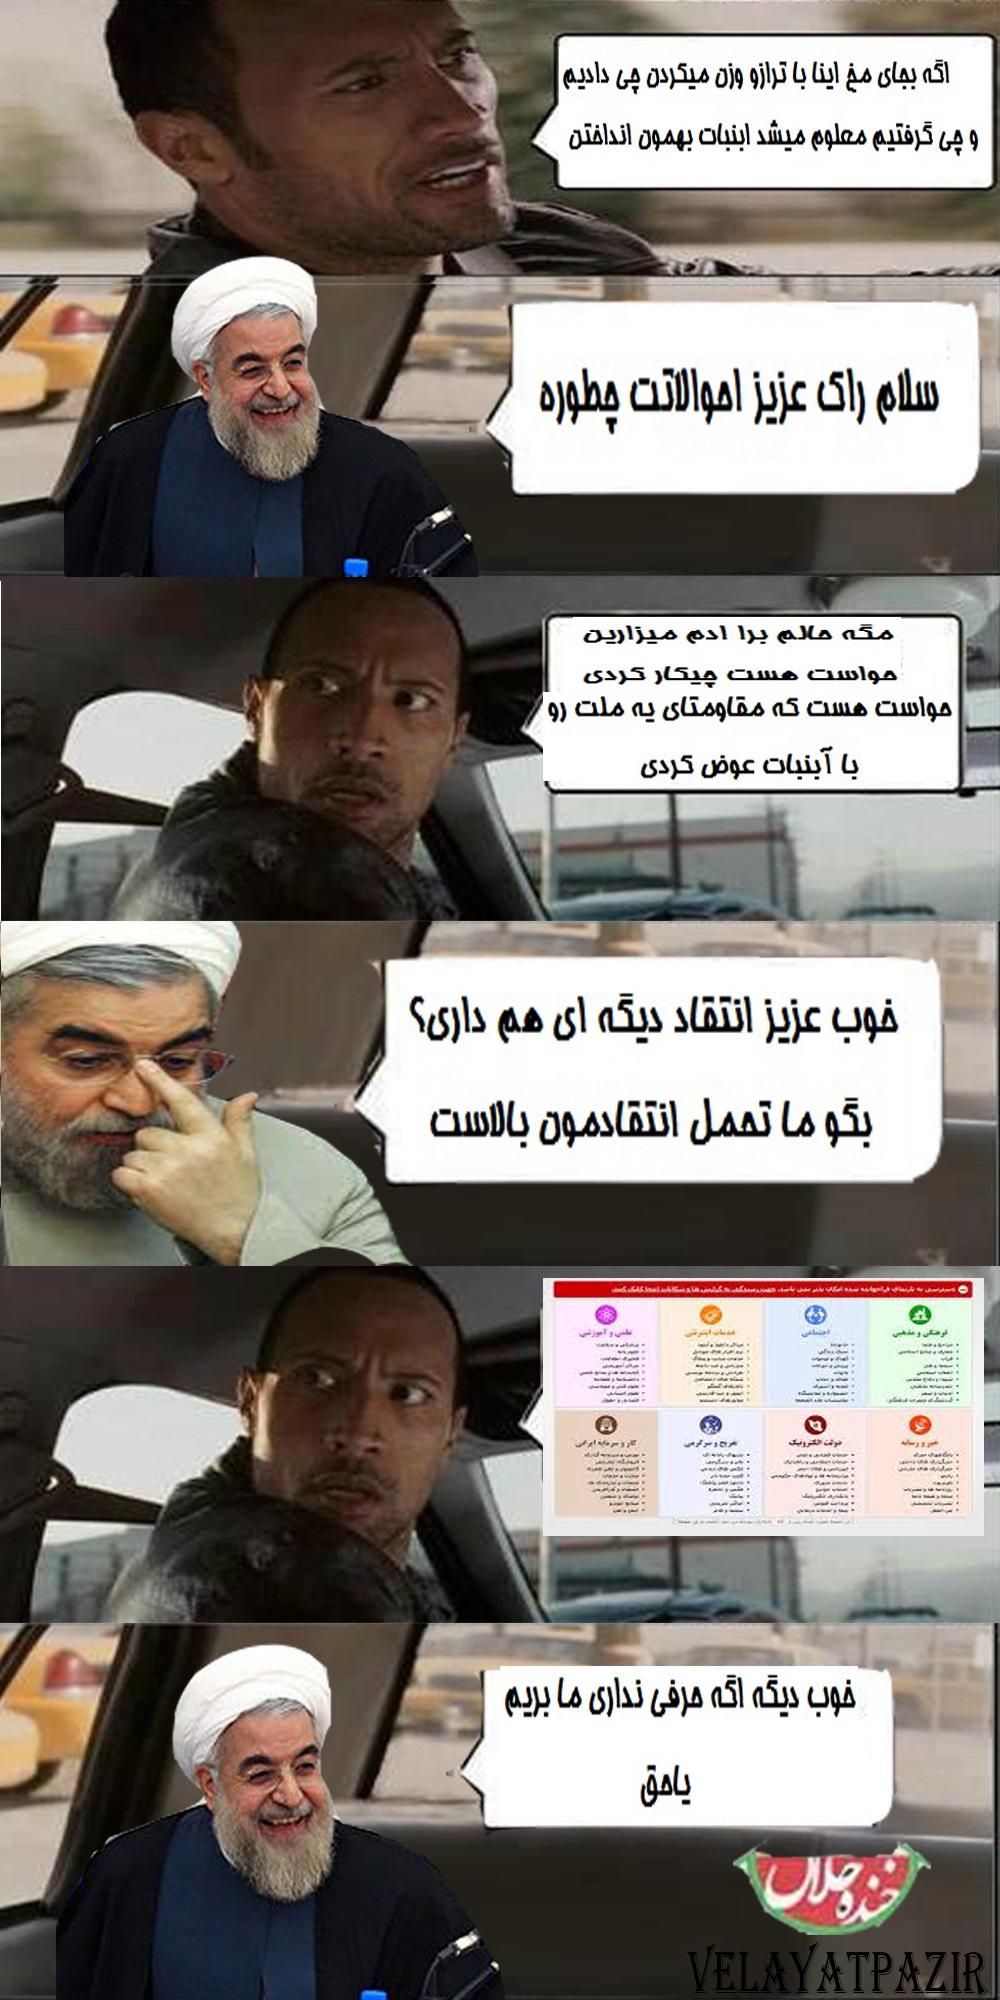 عکس نوشته ی ضد روحانی